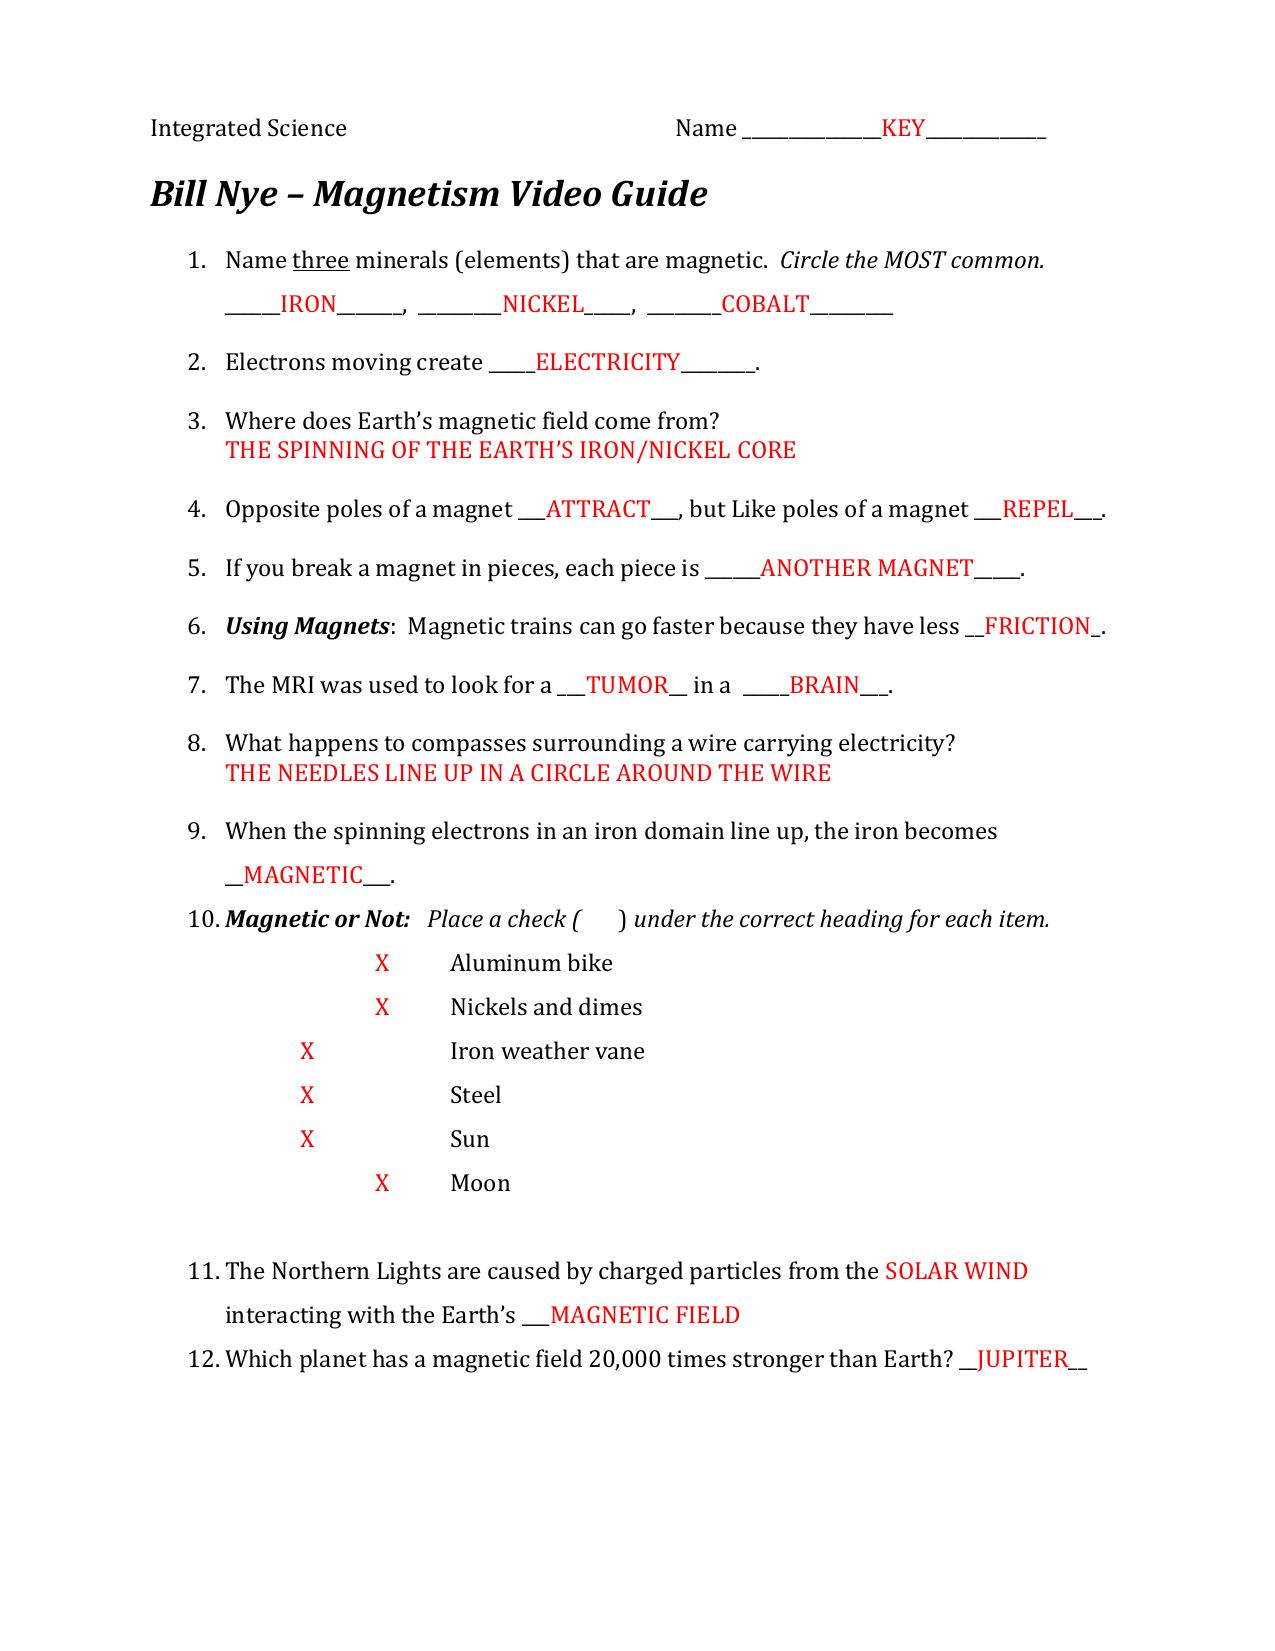 Bill Nye Magnetism Worksheet Answers Db Excel